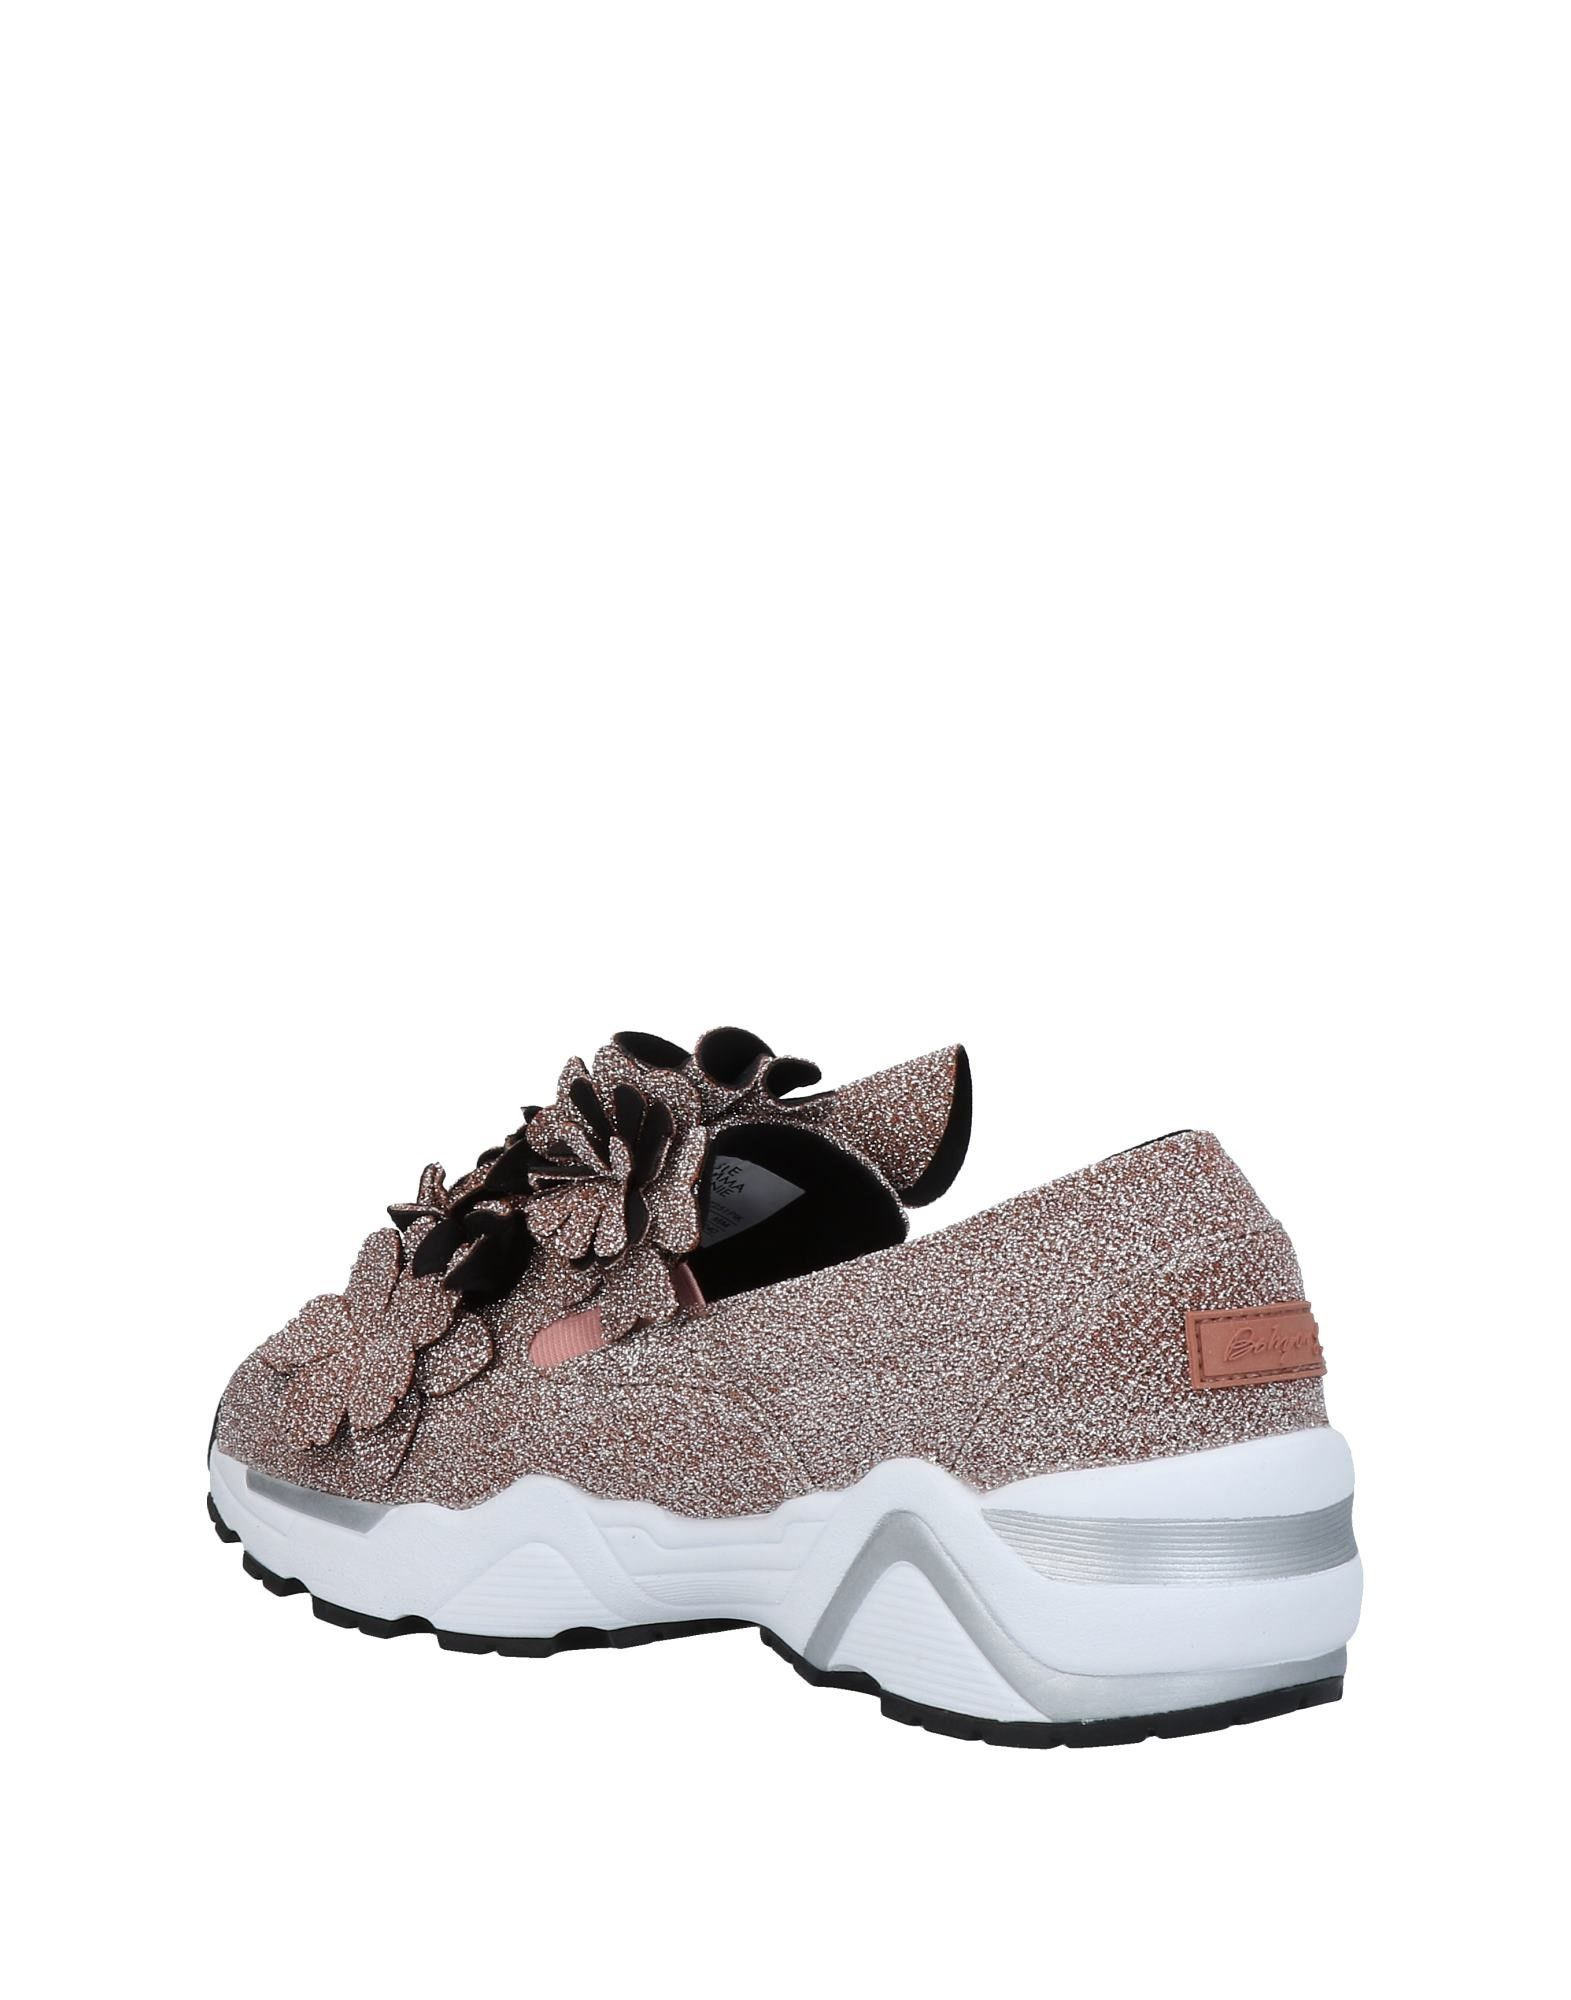 Suecomma Suecomma Suecomma Bonnie Sneakers Damen Gutes Preis-Leistungs-Verhältnis, es lohnt sich 2a6d73